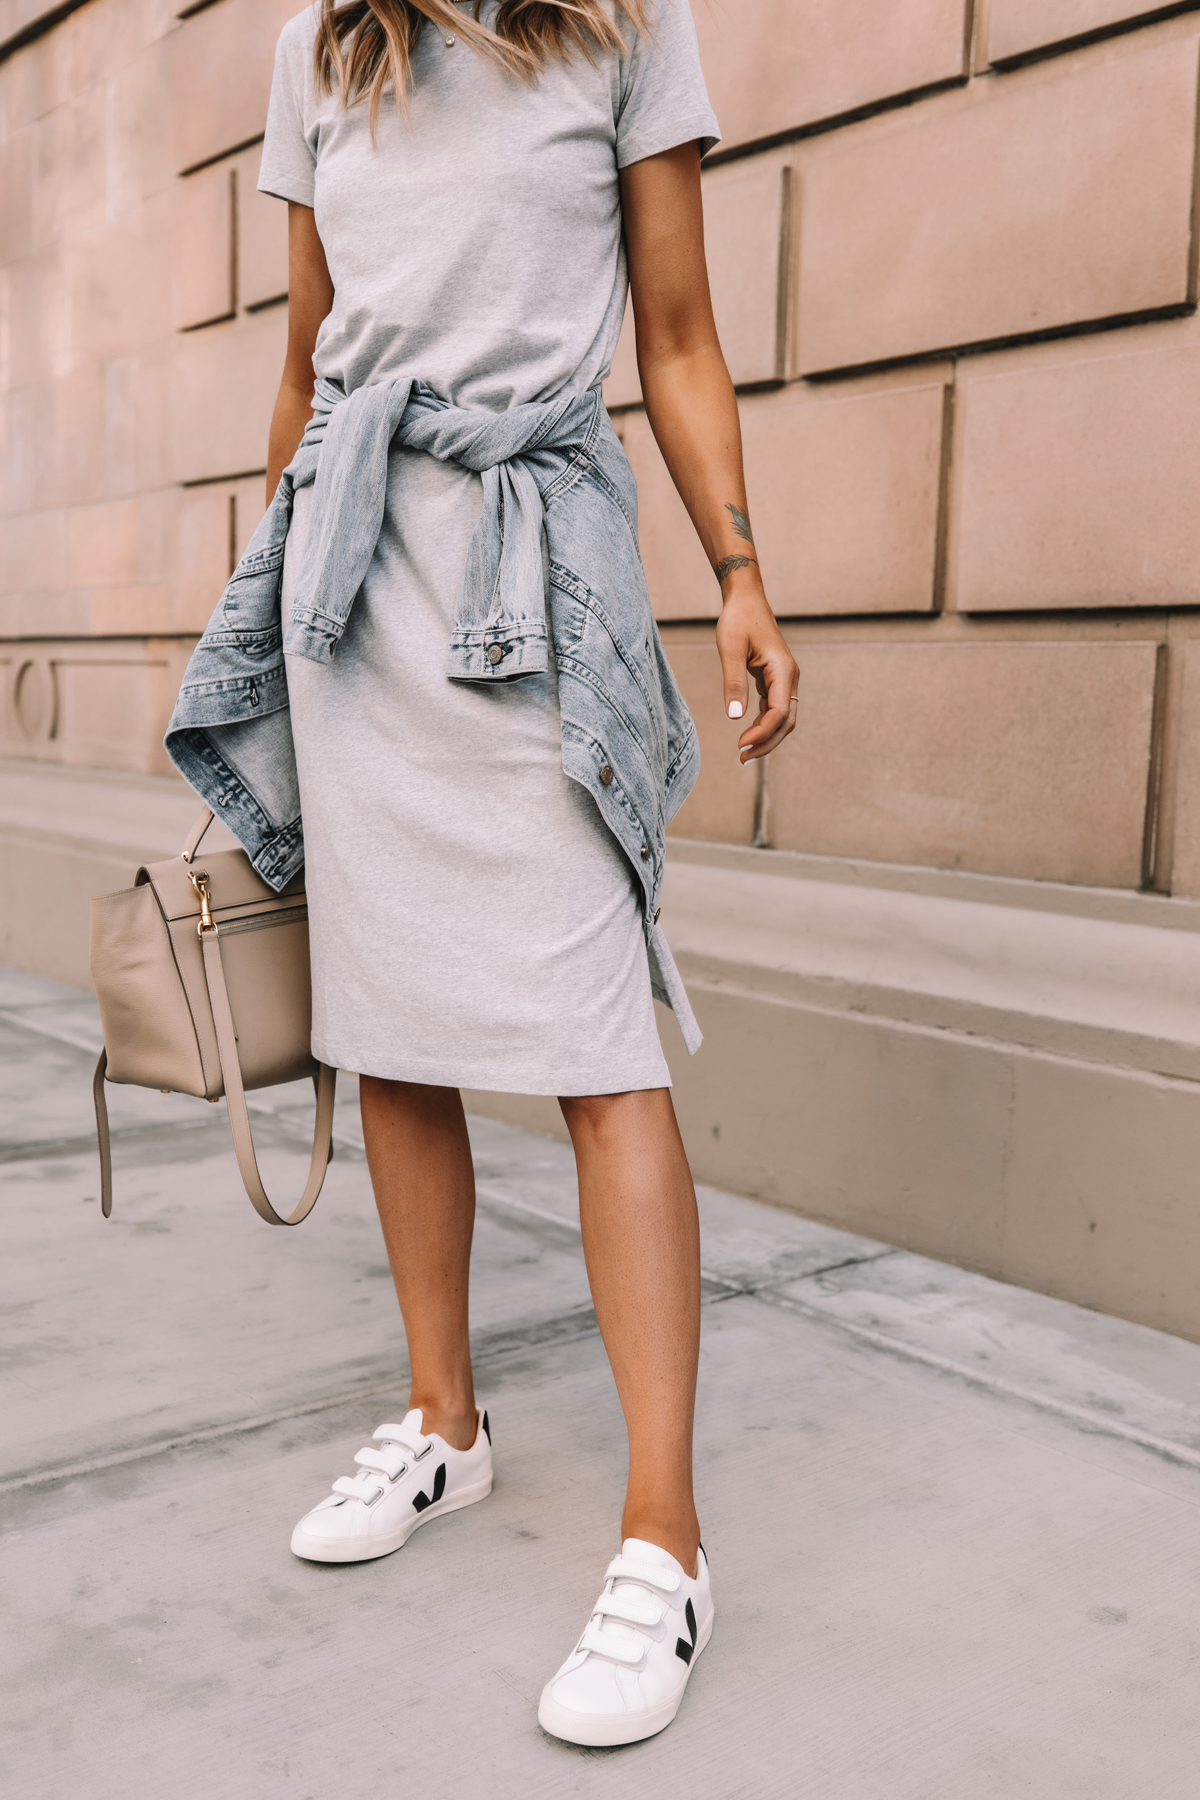 Fashion Jackson Wearing Jcrew Grey Midi Tshirt Dress Denim Jacket Veja Velcro Sneakers Celine Belt Bag